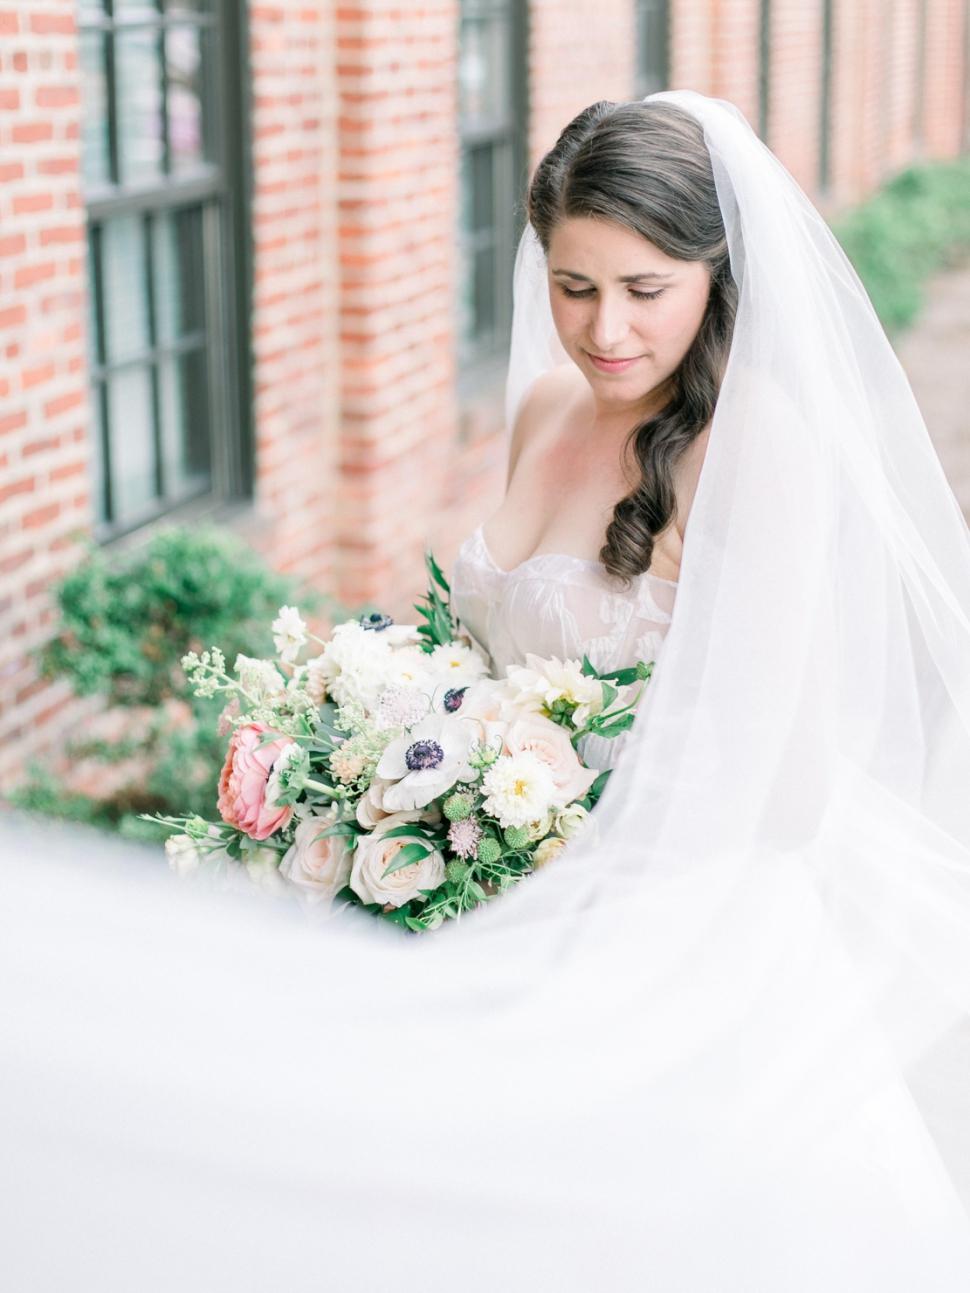 Philadelphia-Wedding-Photographer-Cassi-Claire-Cork-Factory-Hotel-Wedding_11.jpg